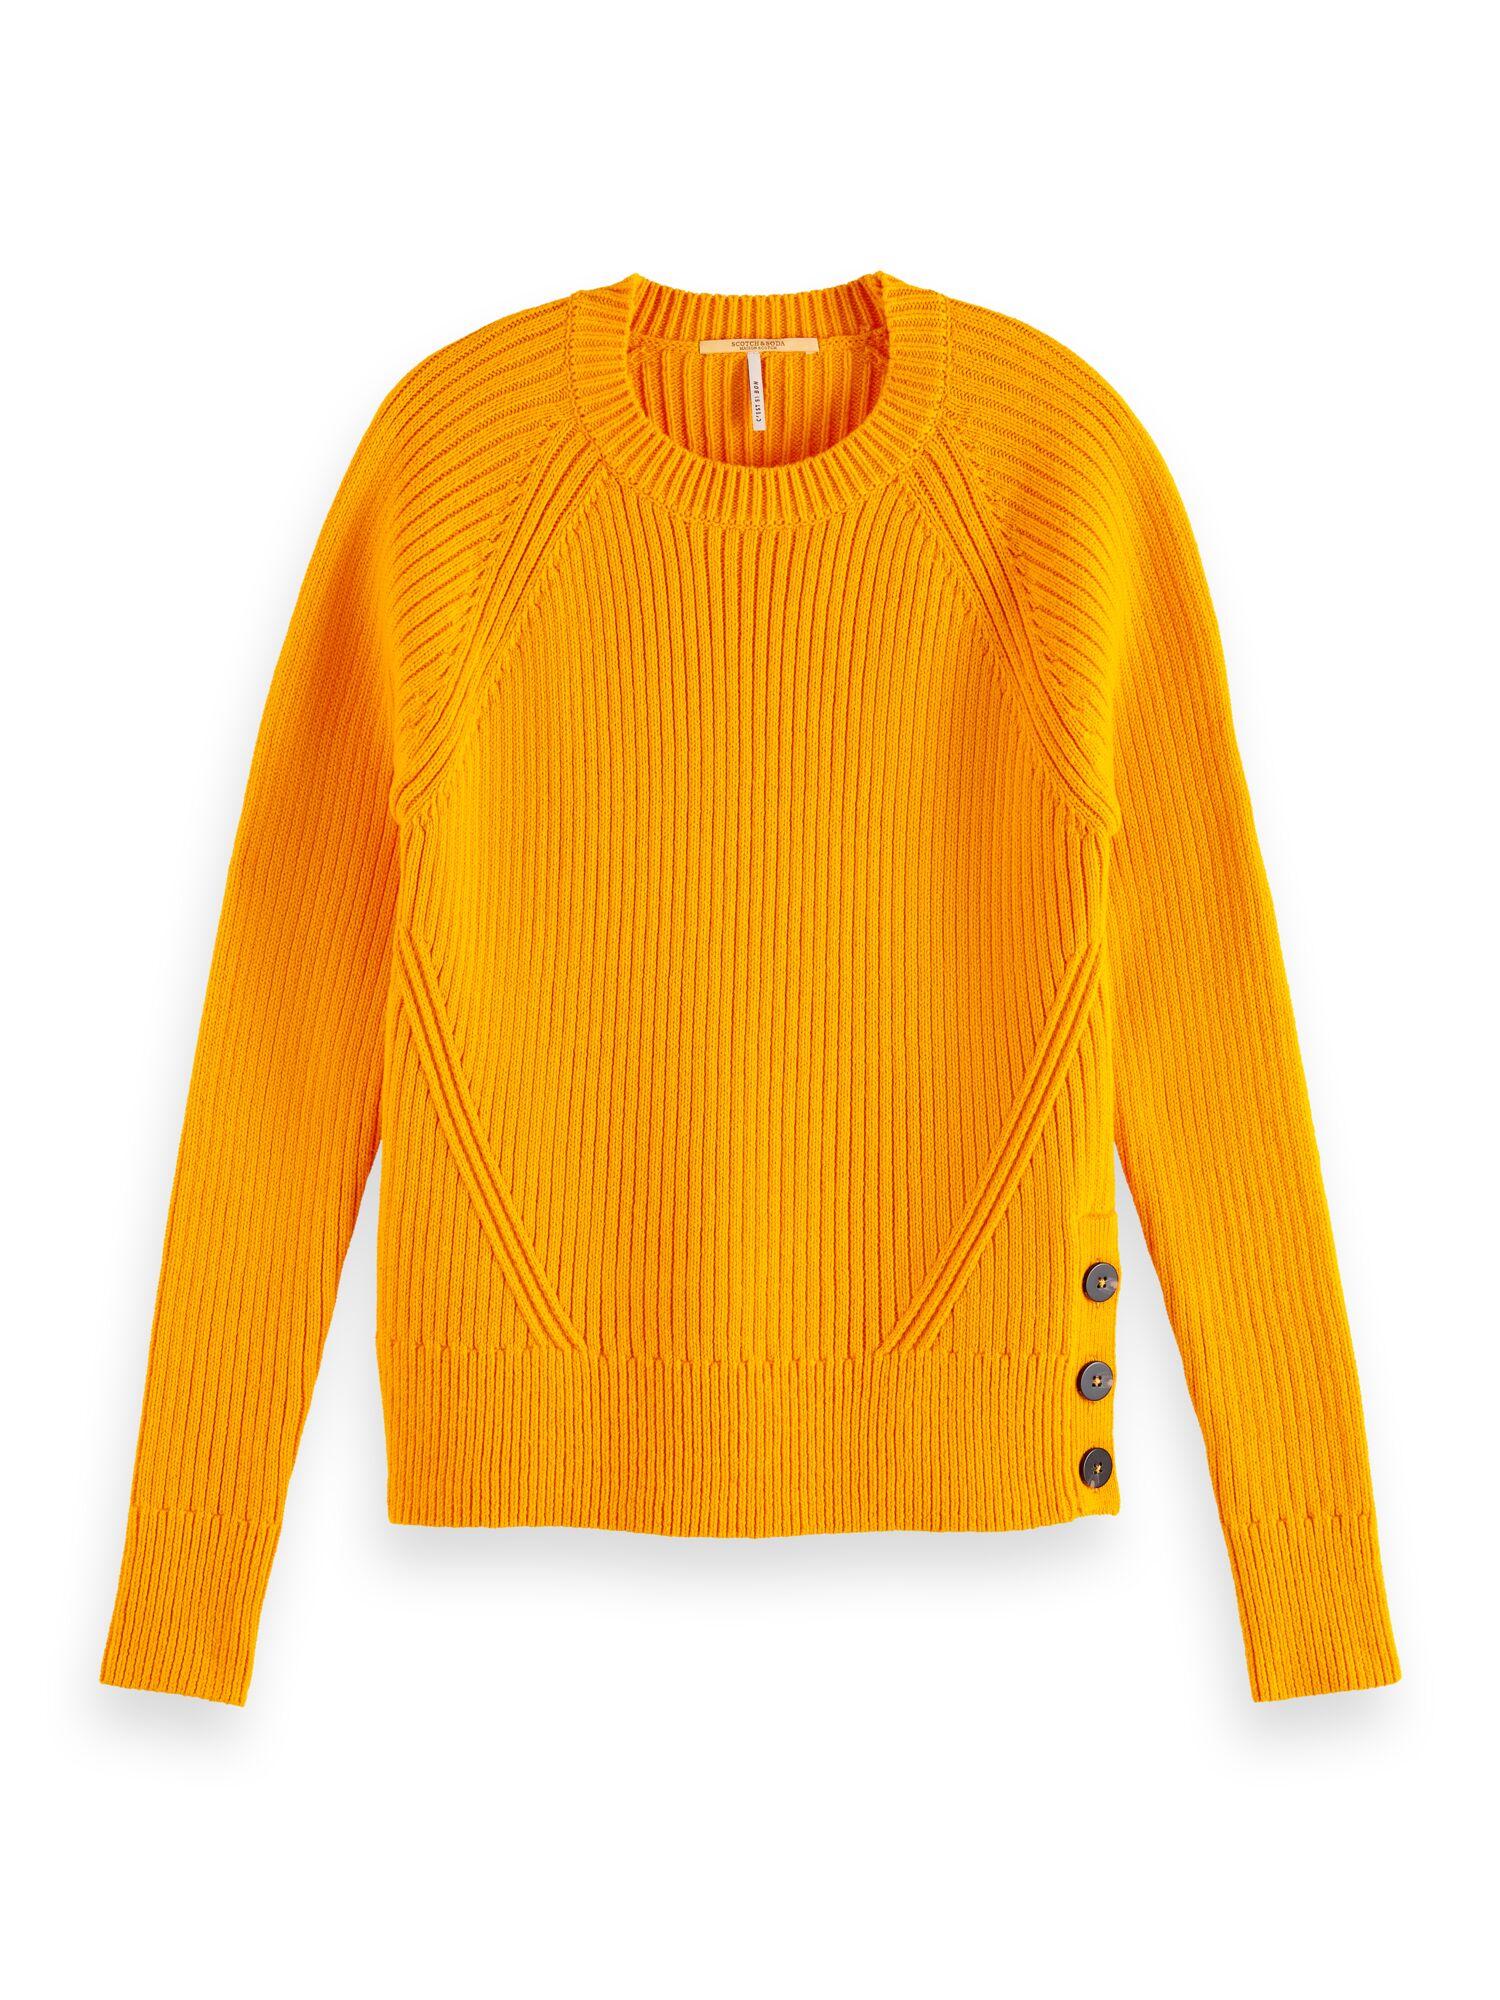 Scotch & Soda | Crew neck ribbed knit in organic cotton blend